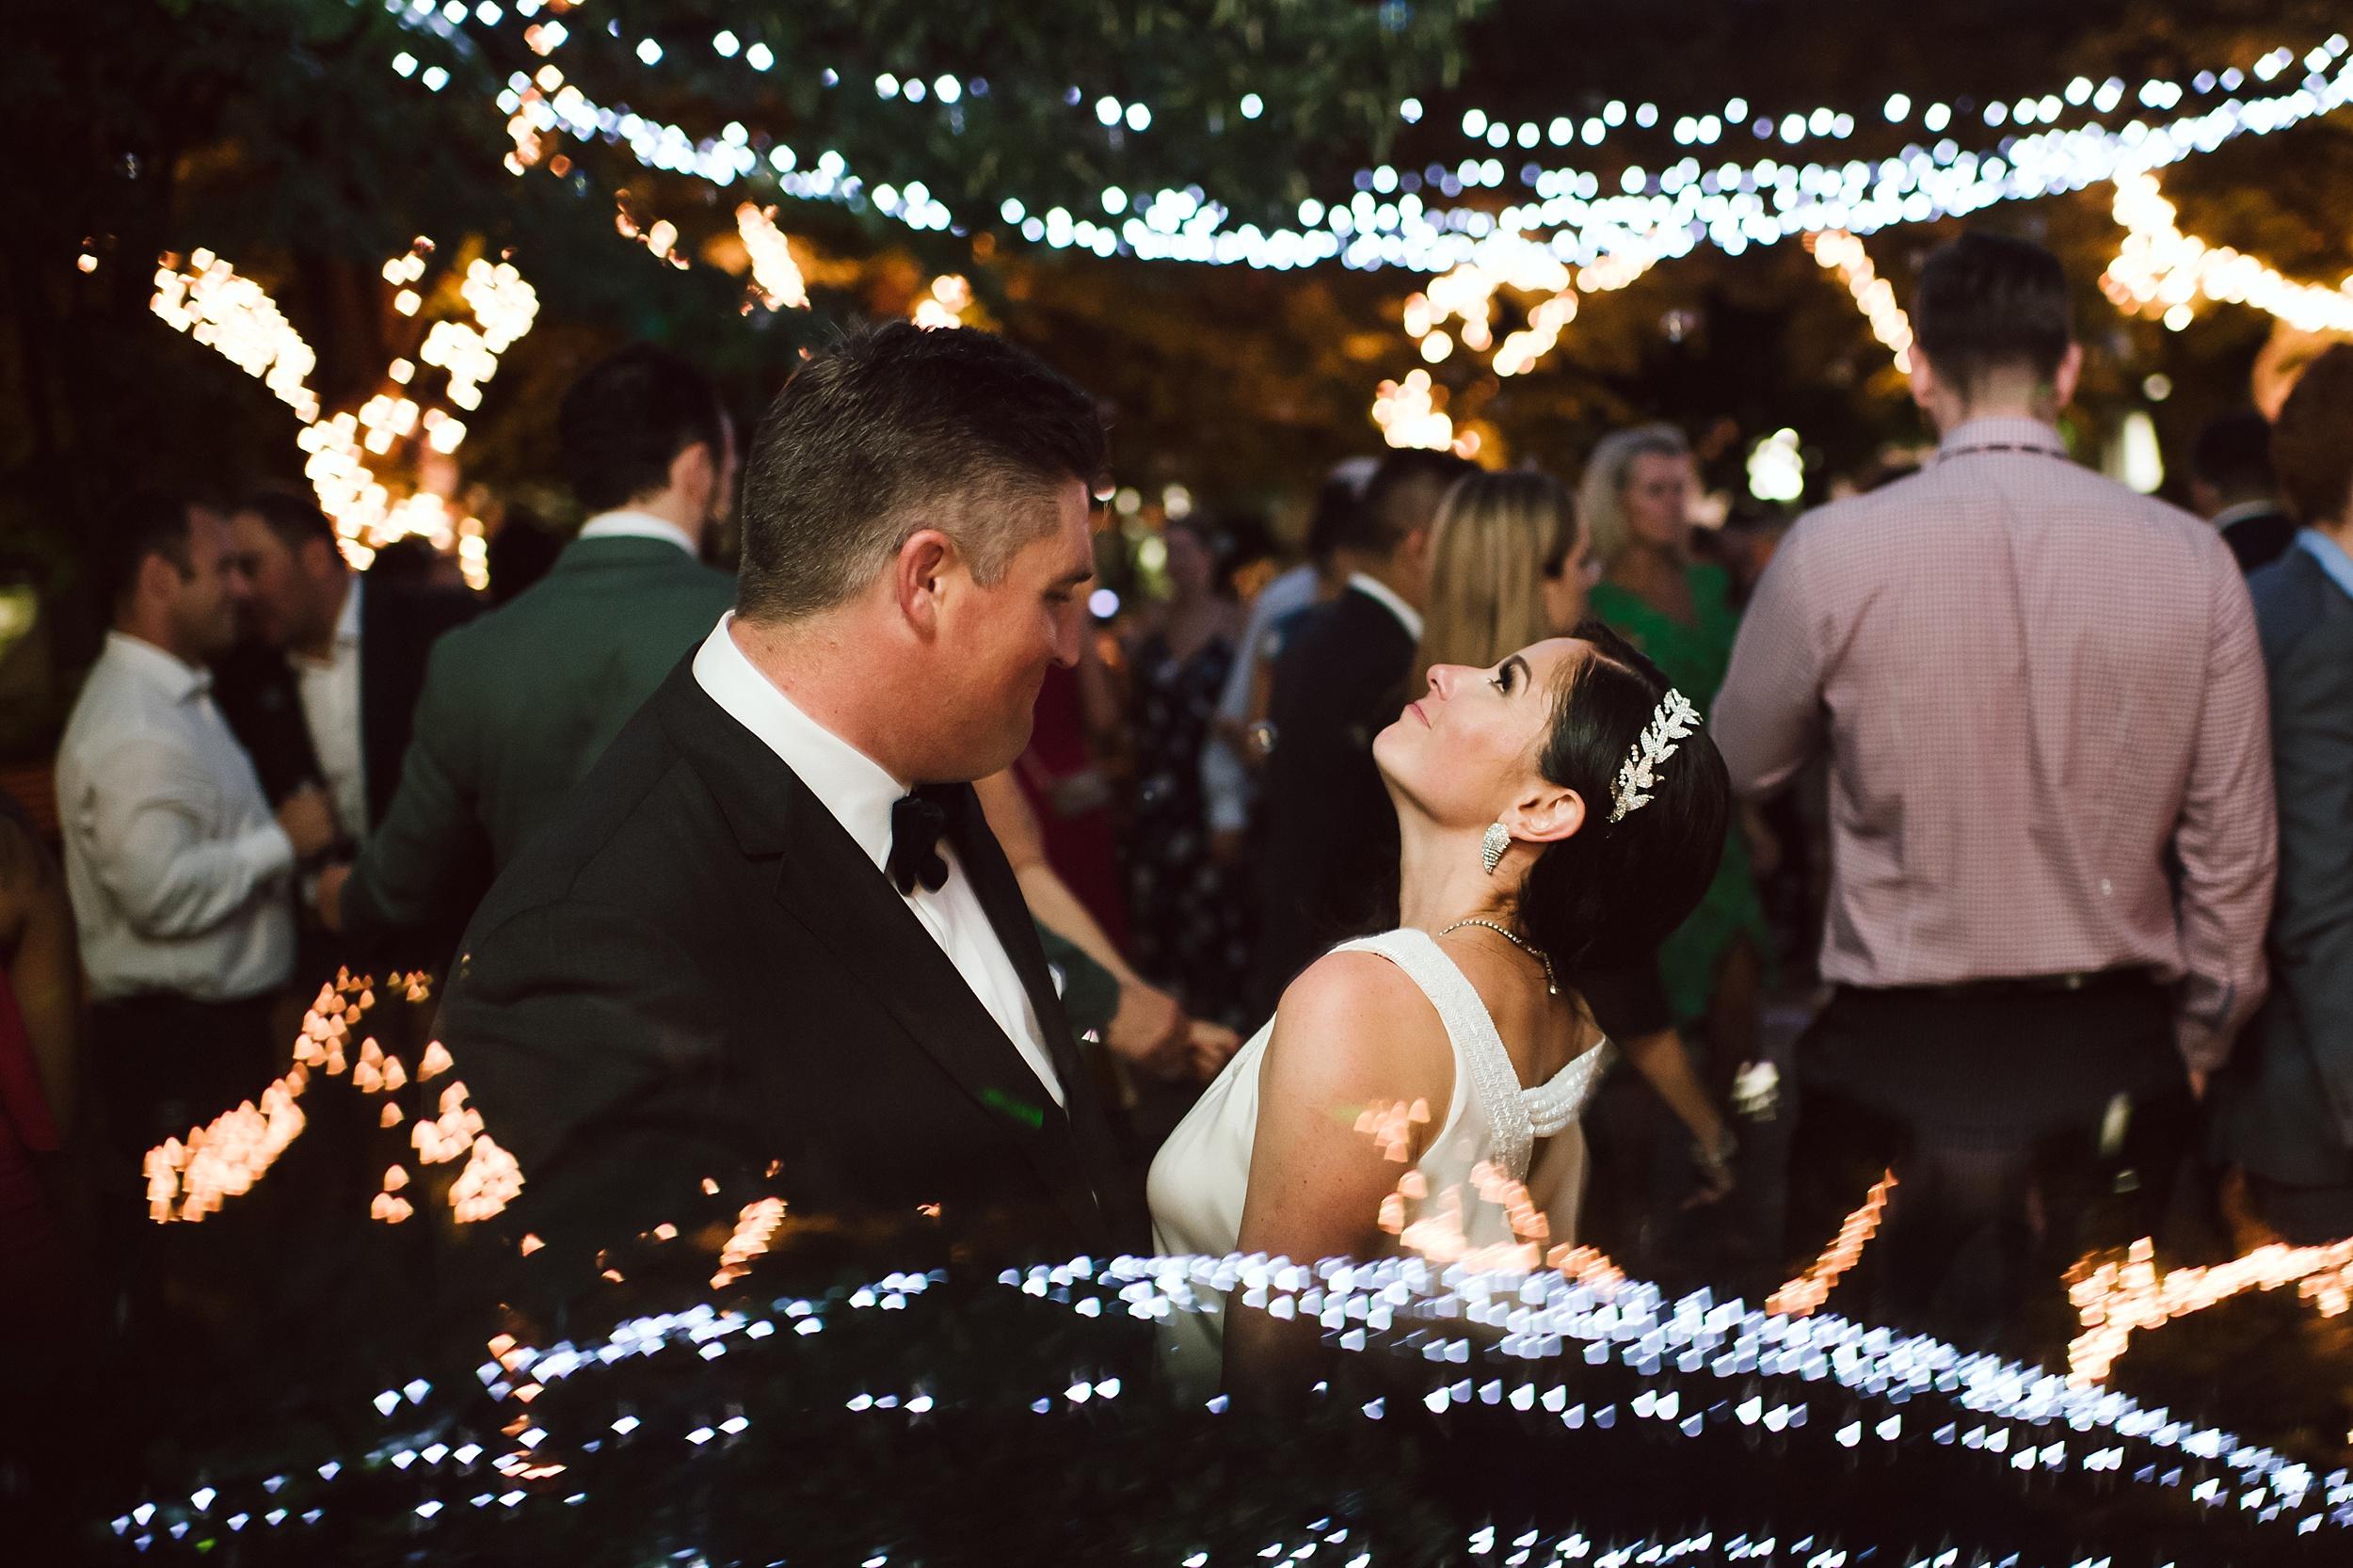 Sunnyside_Pavilion_Wedding_Toronto_Photographer_0129.jpg